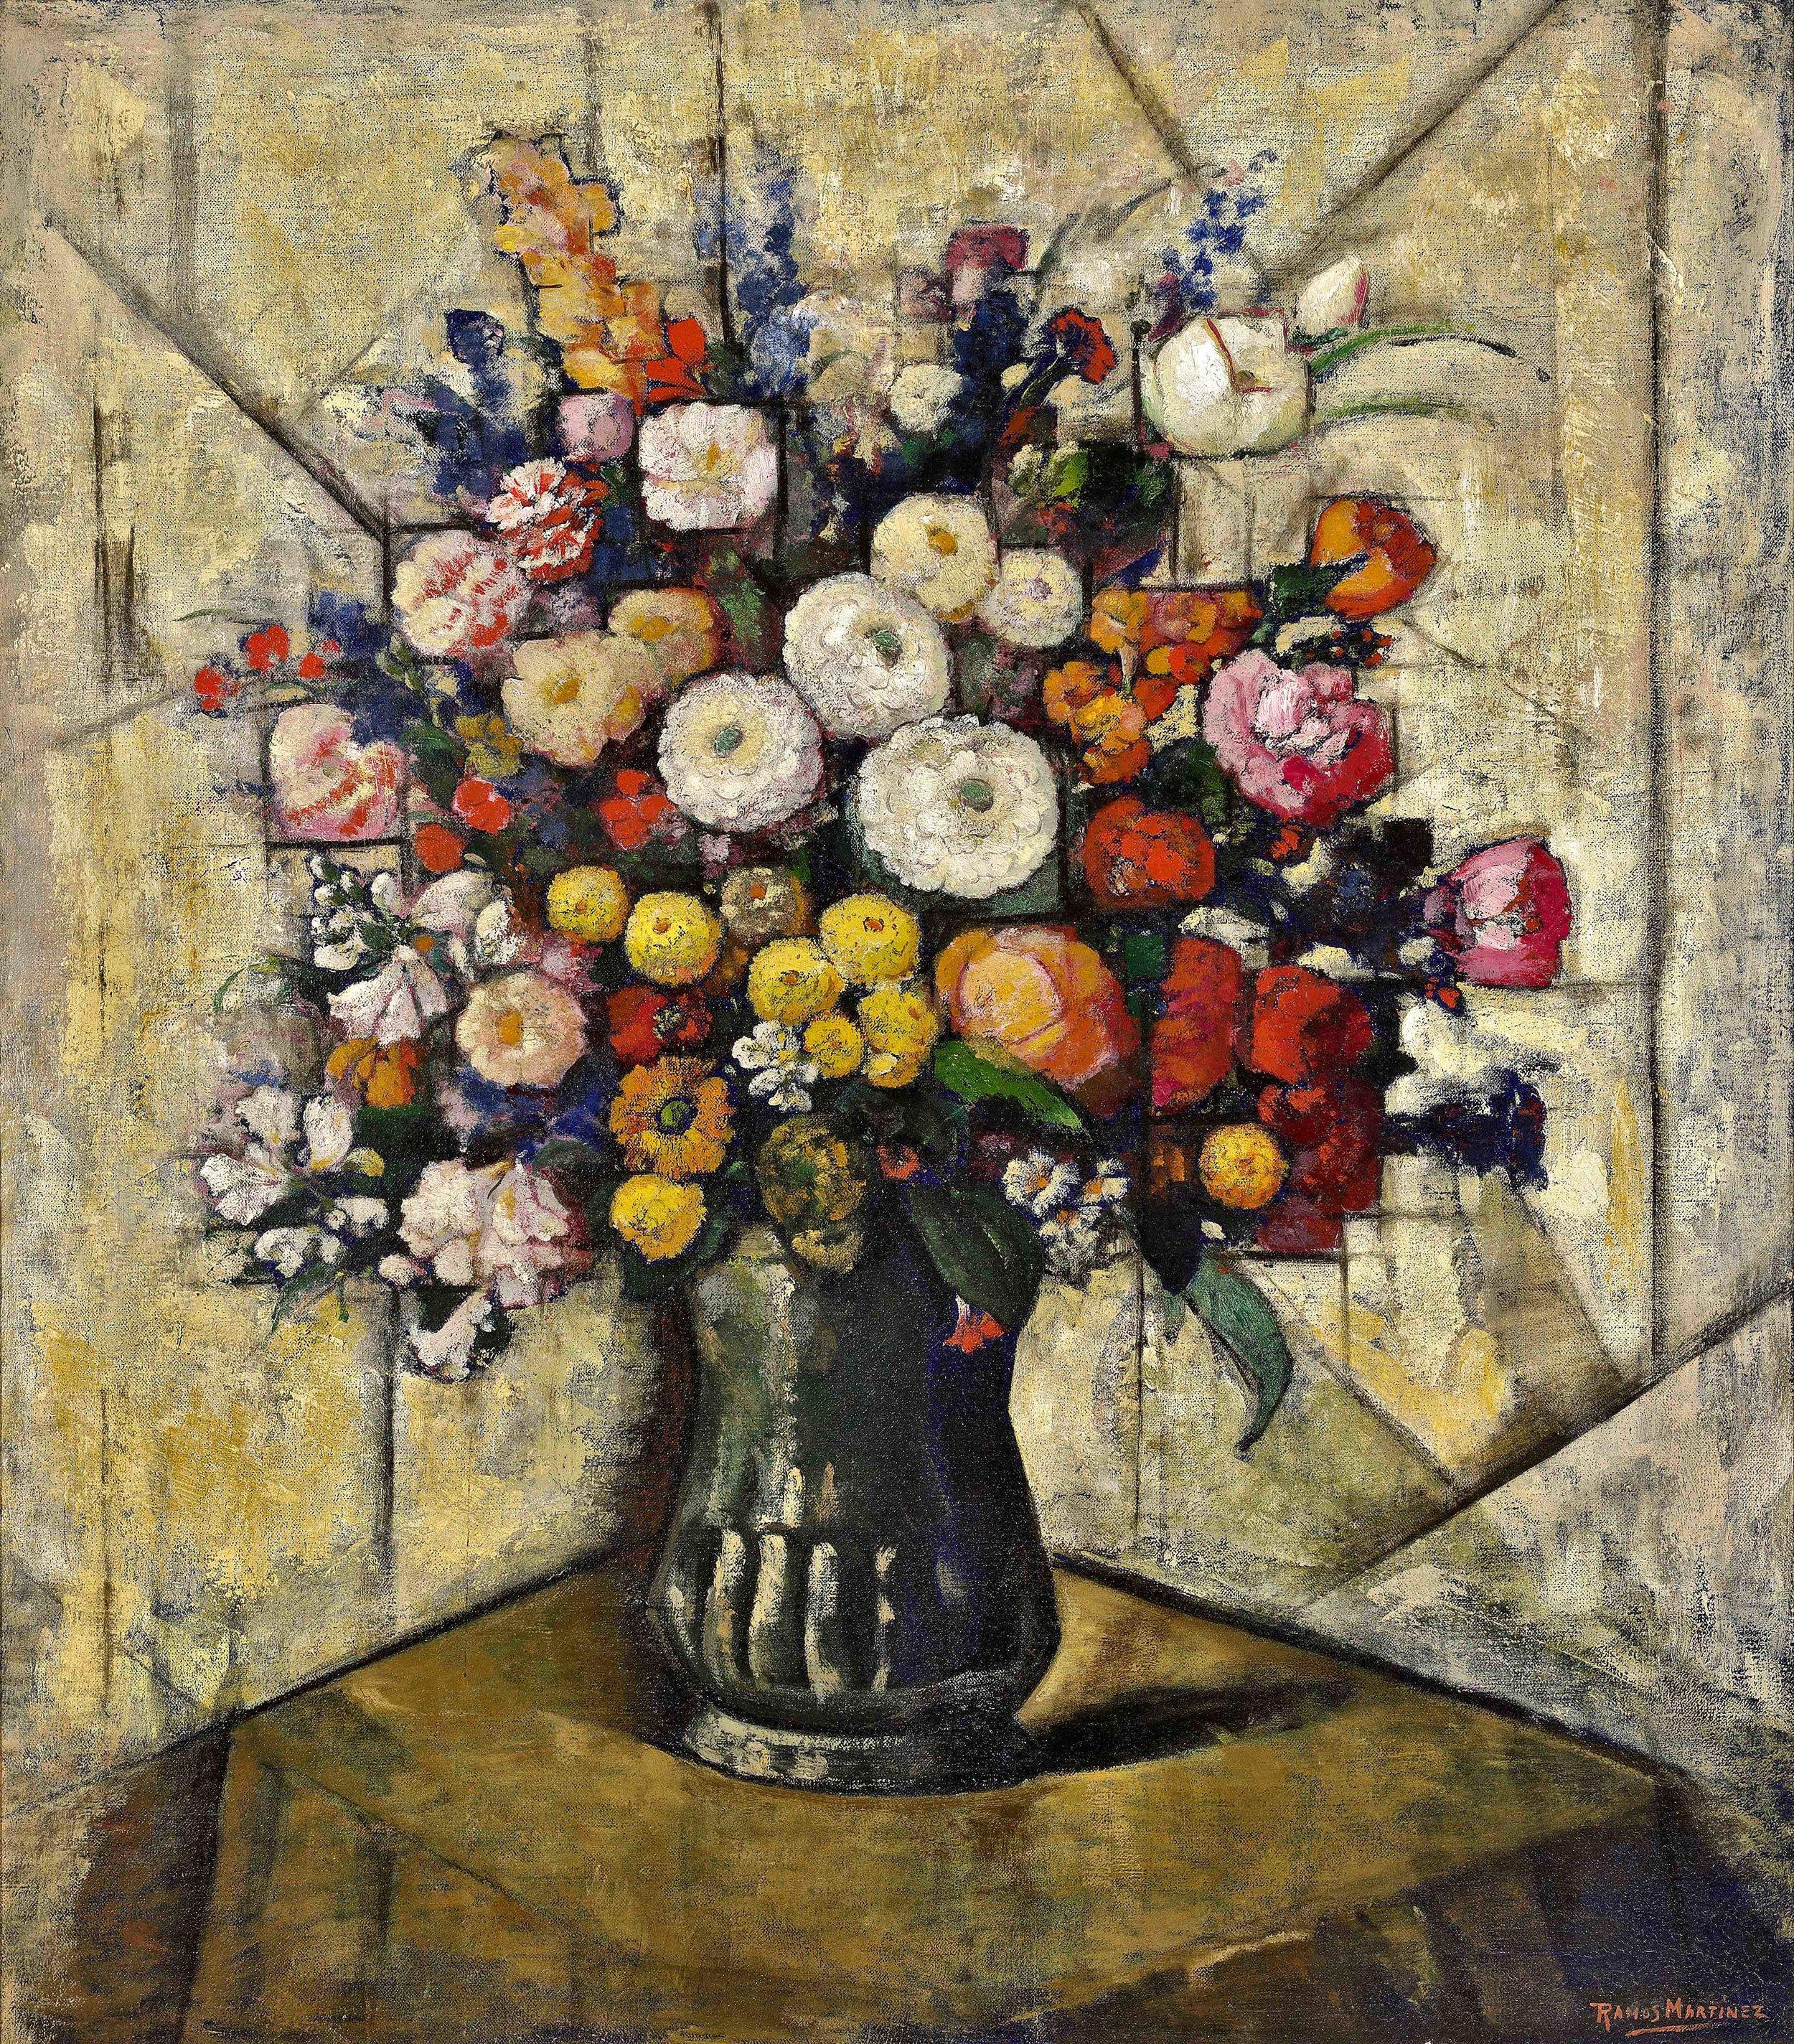 Ramo de Flores / Flower Bouquet  1937 oil on canvas / óleo sobre tela 32 x 28 inches; 81.3 x 71.1 centímetros